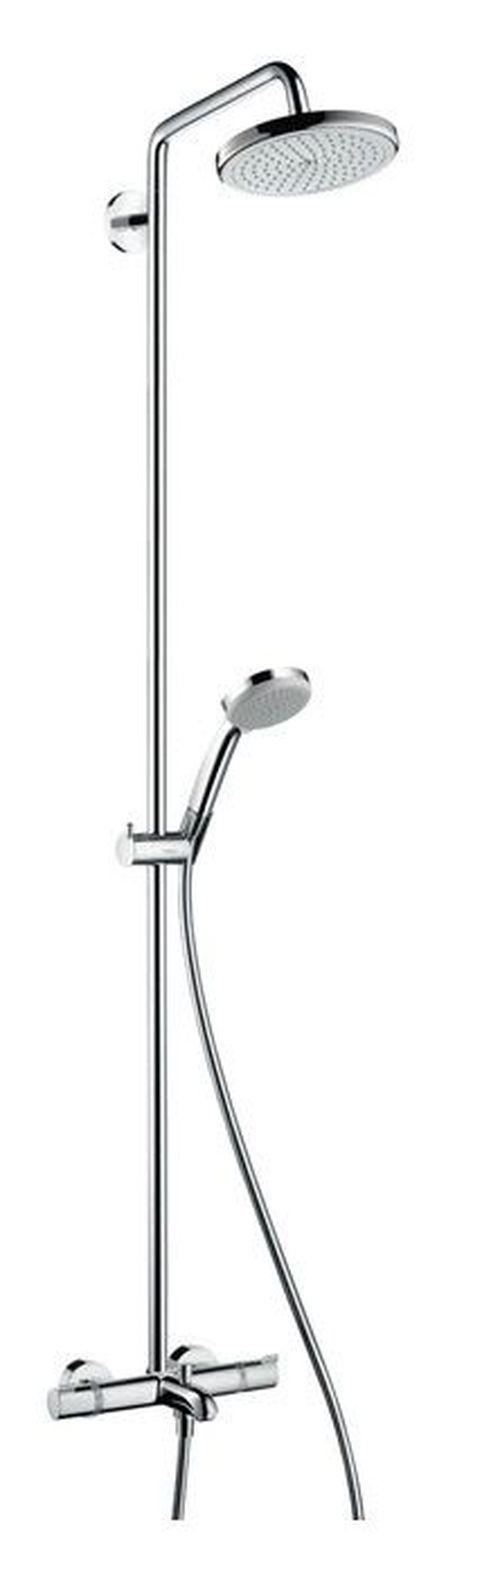 Hansgrohe Shower Set | Bathing | kanbkam.com